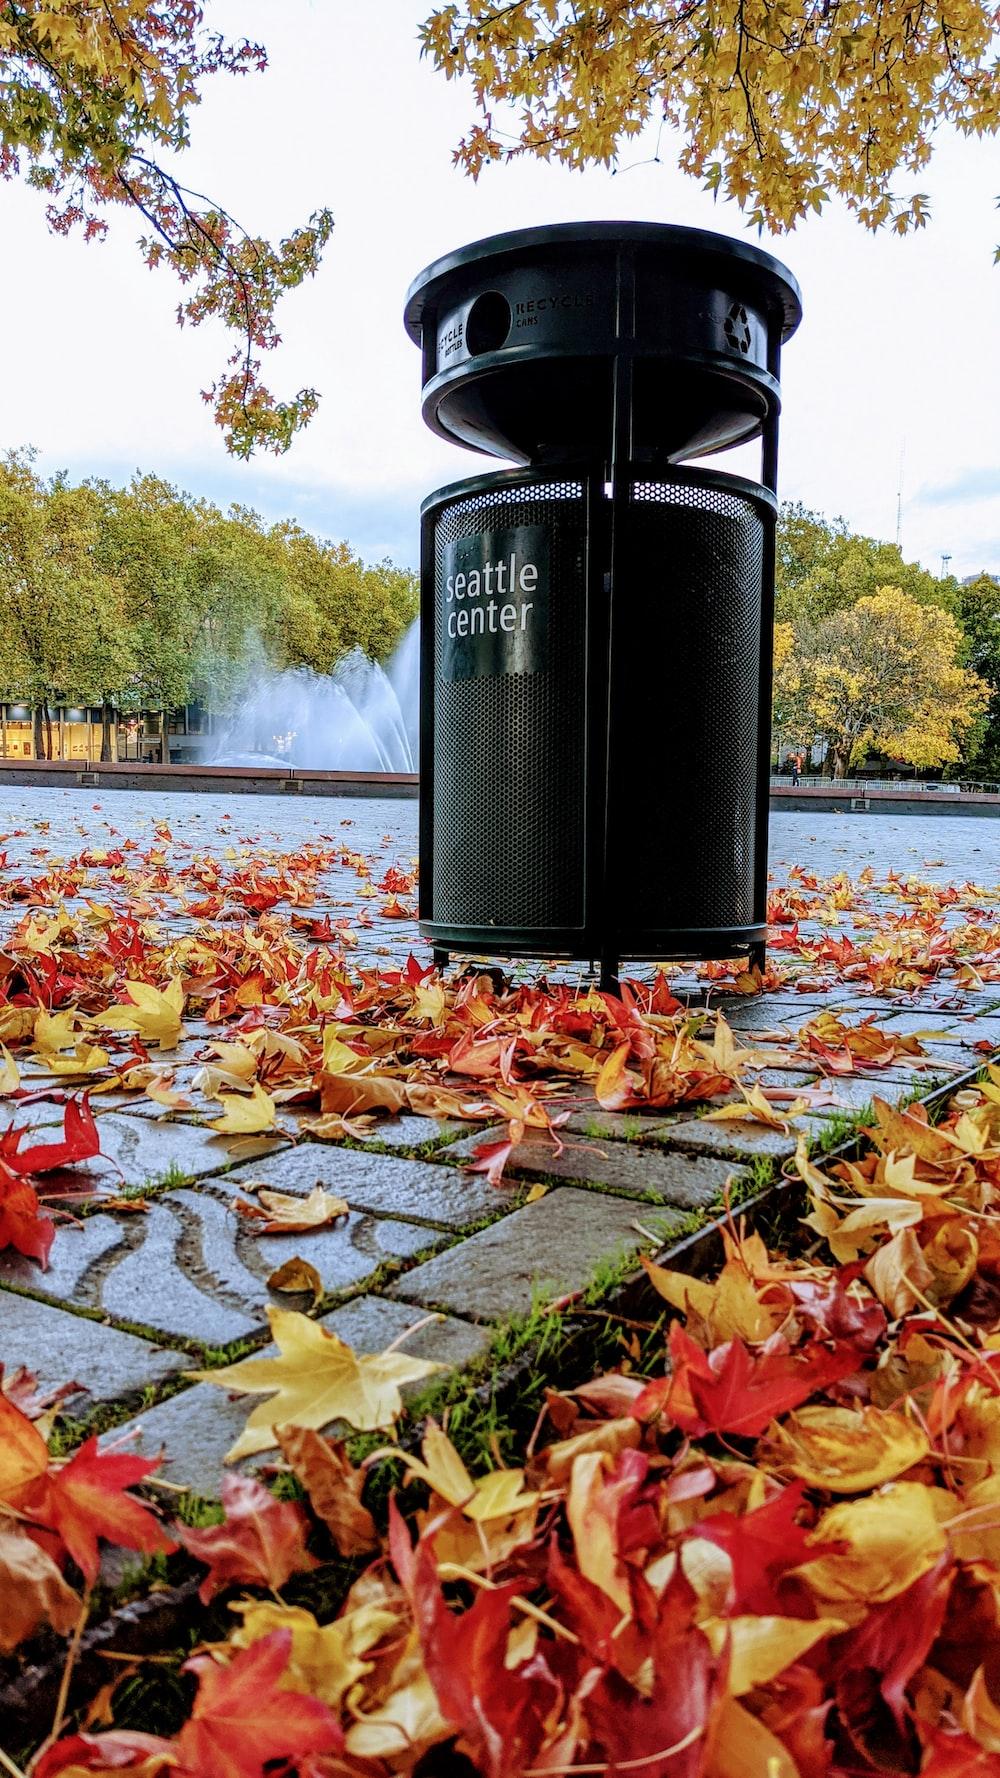 black steel trash bin on brown leaves near body of water during daytime